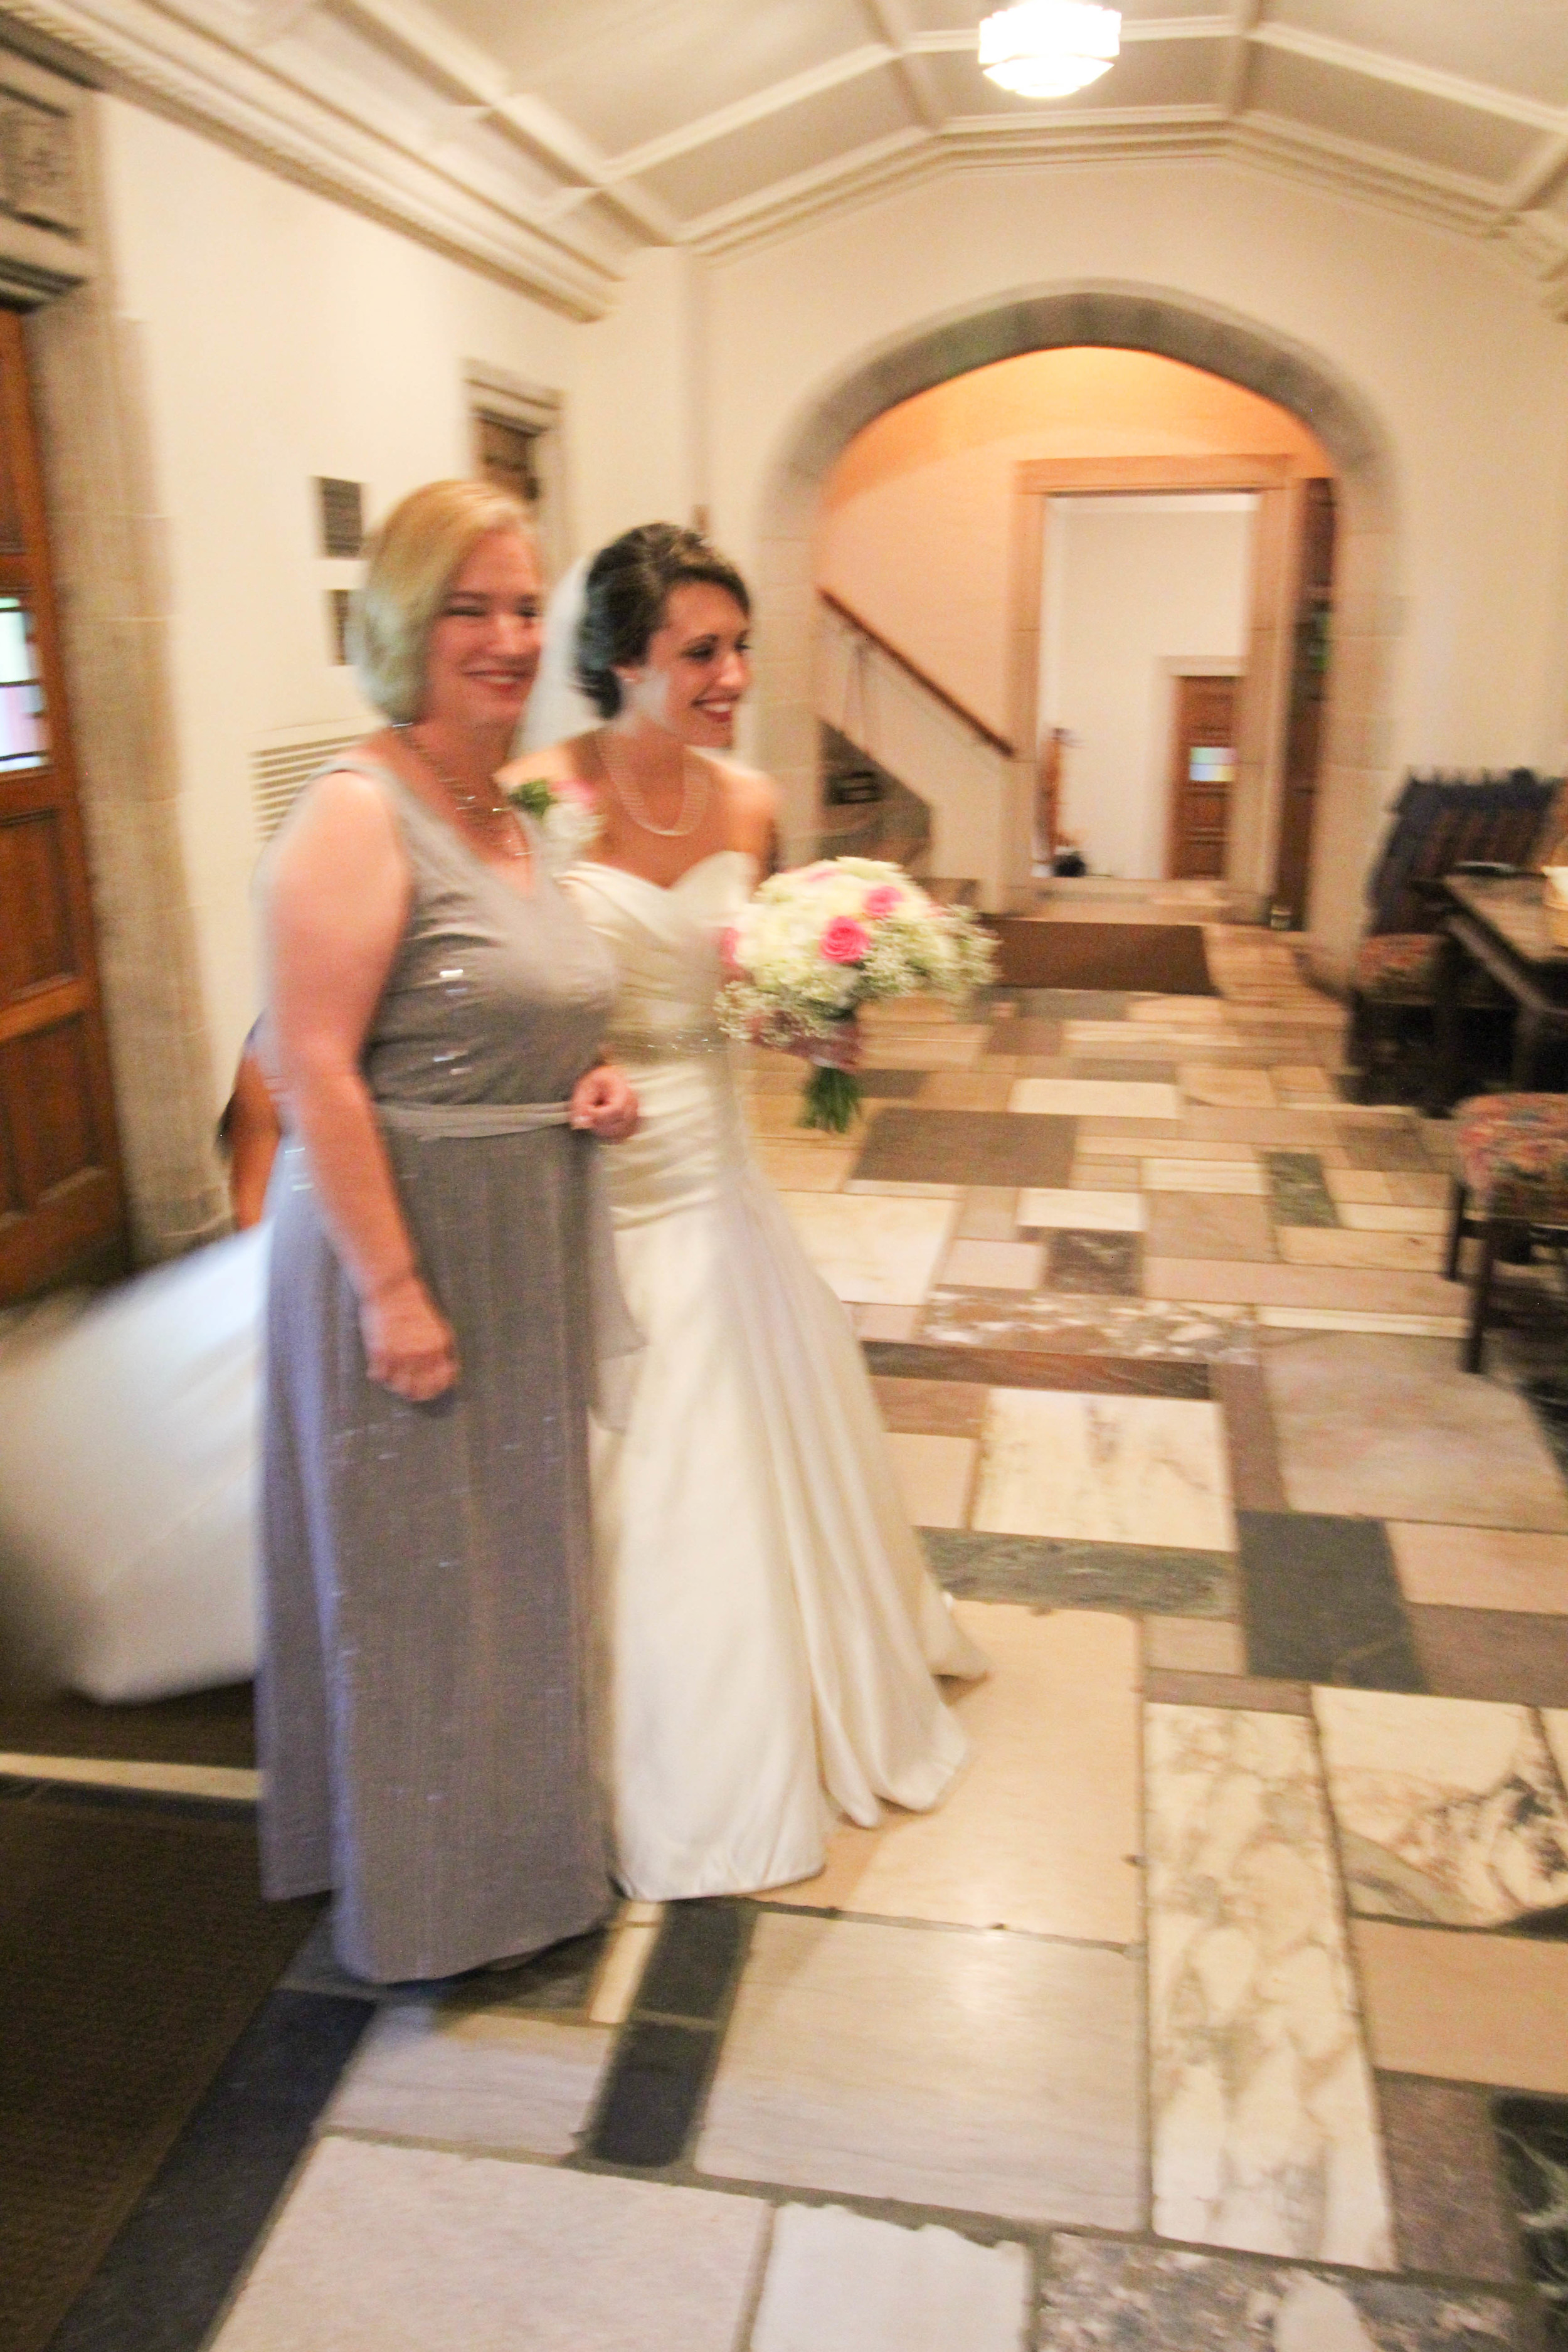 family-ceremony-139.jpg